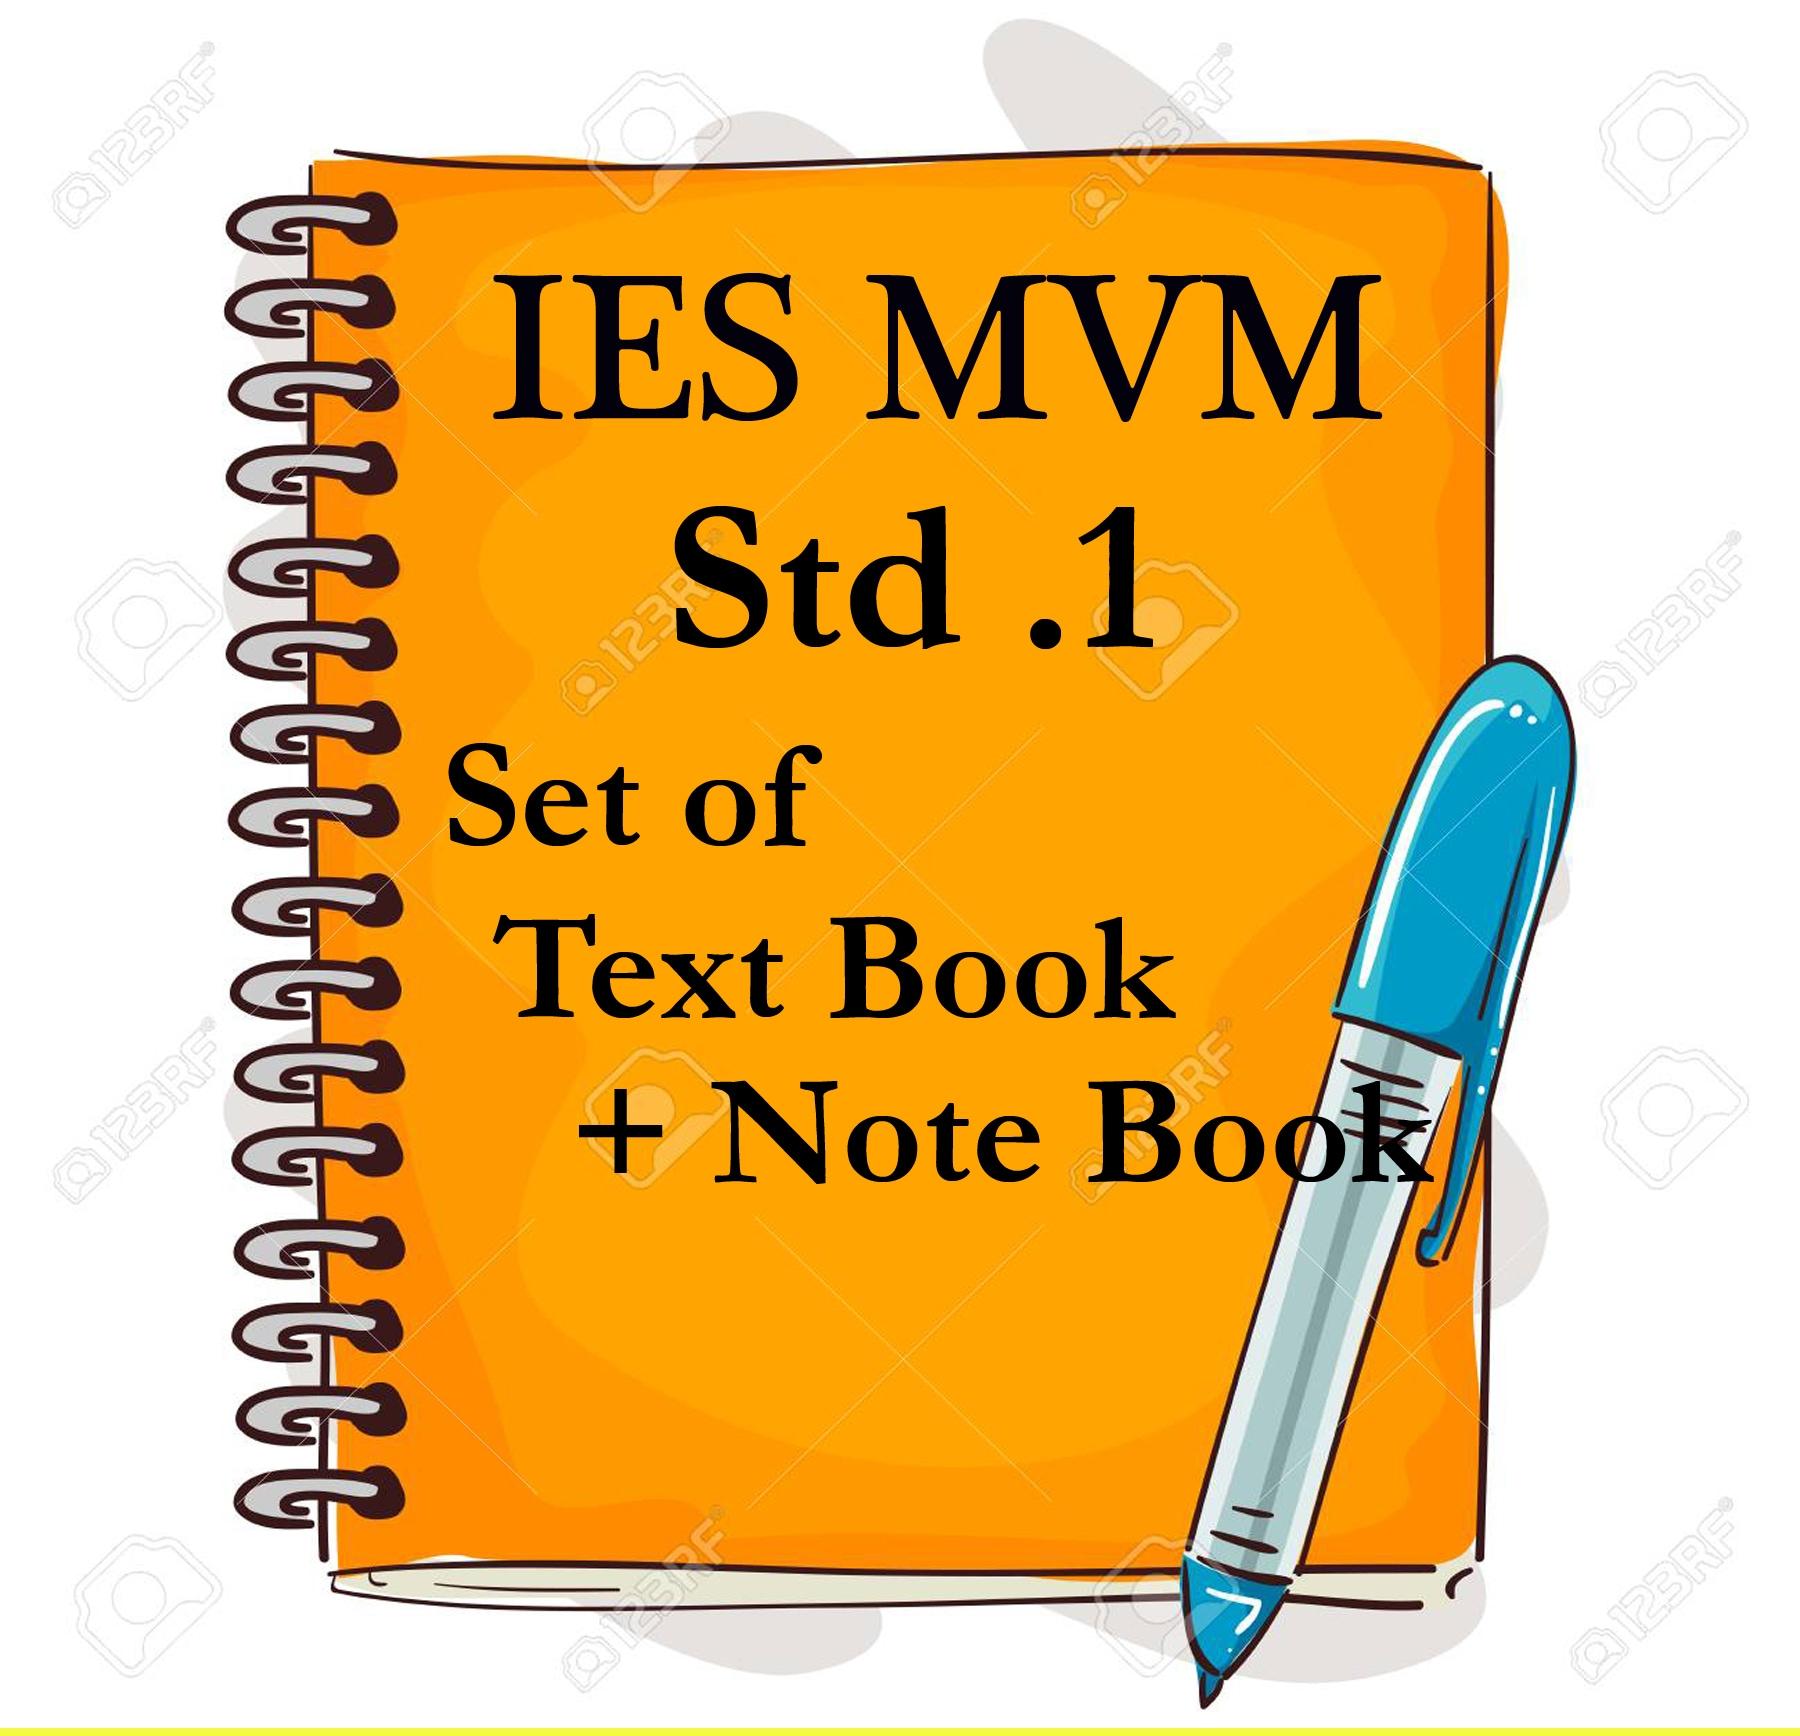 IES MVM STD .1 SET  OF TEXT BOOK + NOTE BOOK